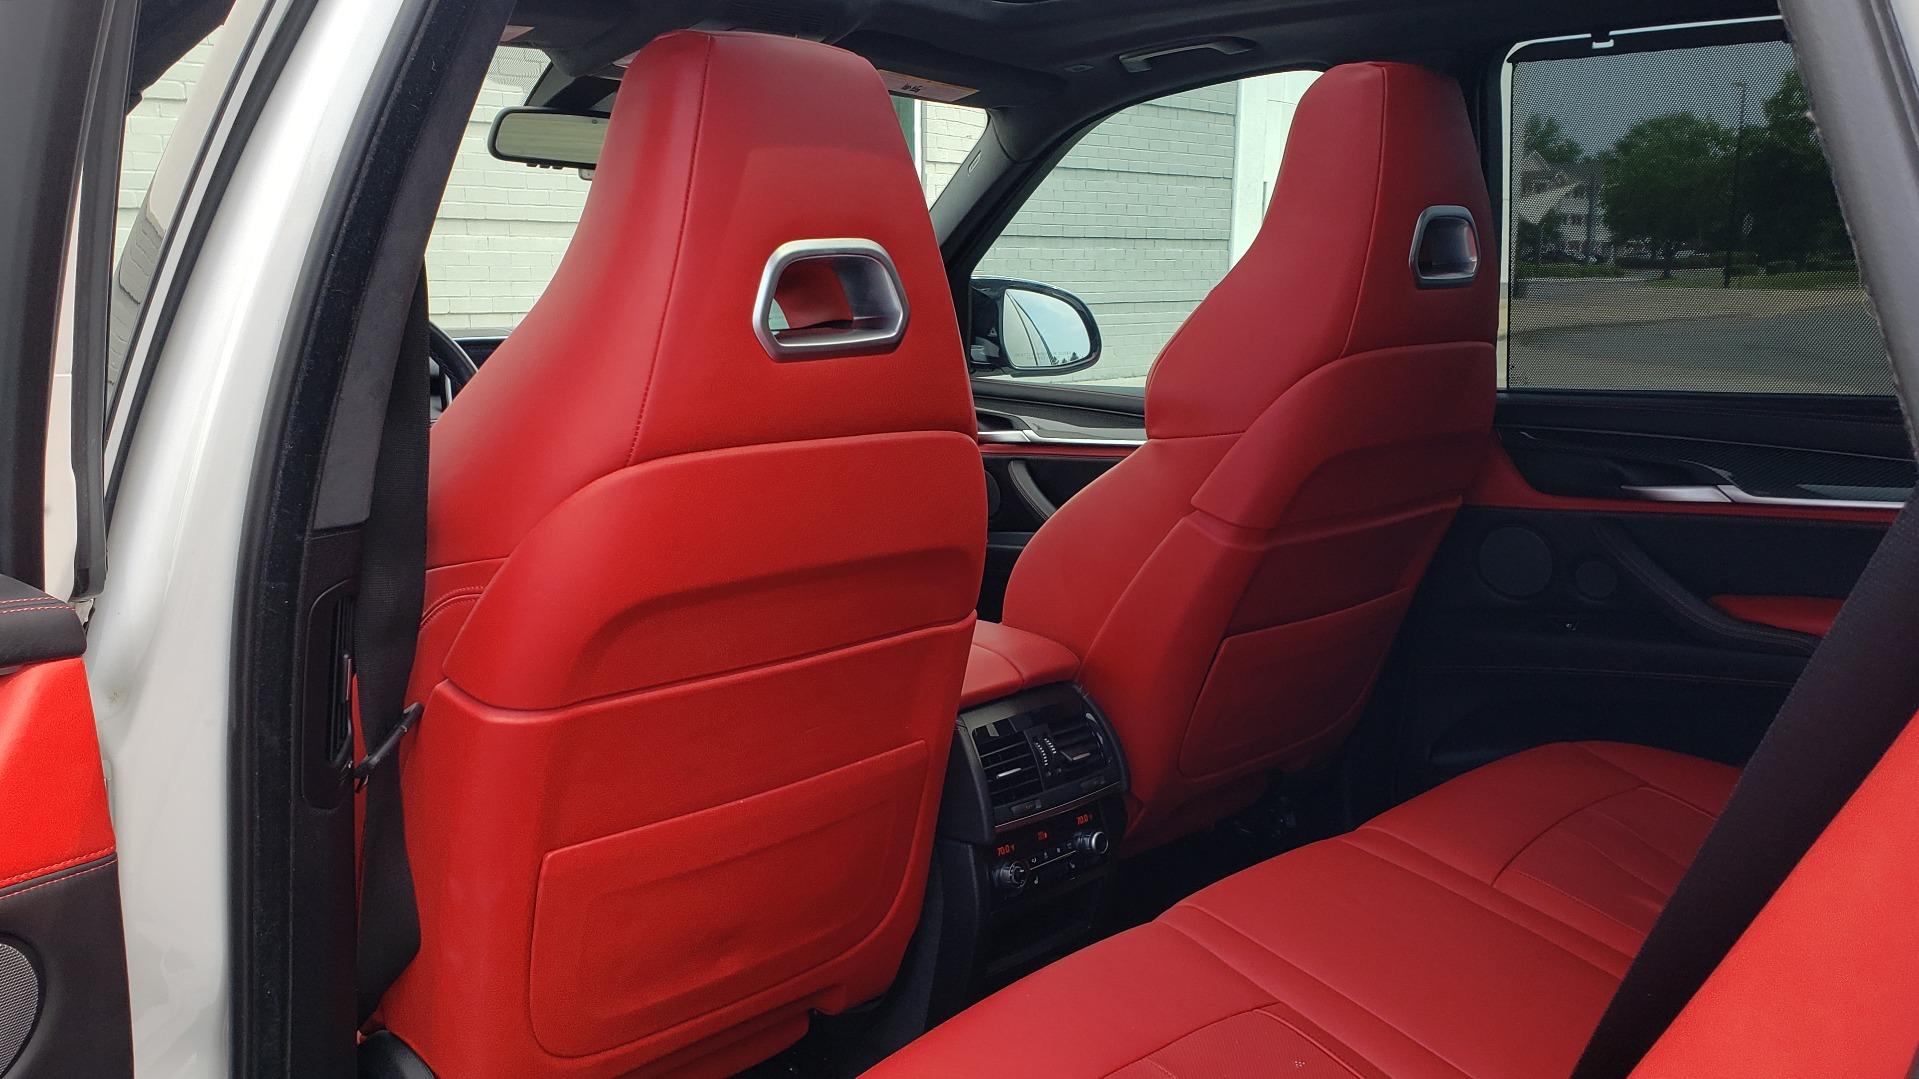 Used 2017 BMW X5 M EXECUTIVE PKG / NAV / DRVR ASST / BSM / HUD / HTD STS / WIFI for sale Sold at Formula Imports in Charlotte NC 28227 67